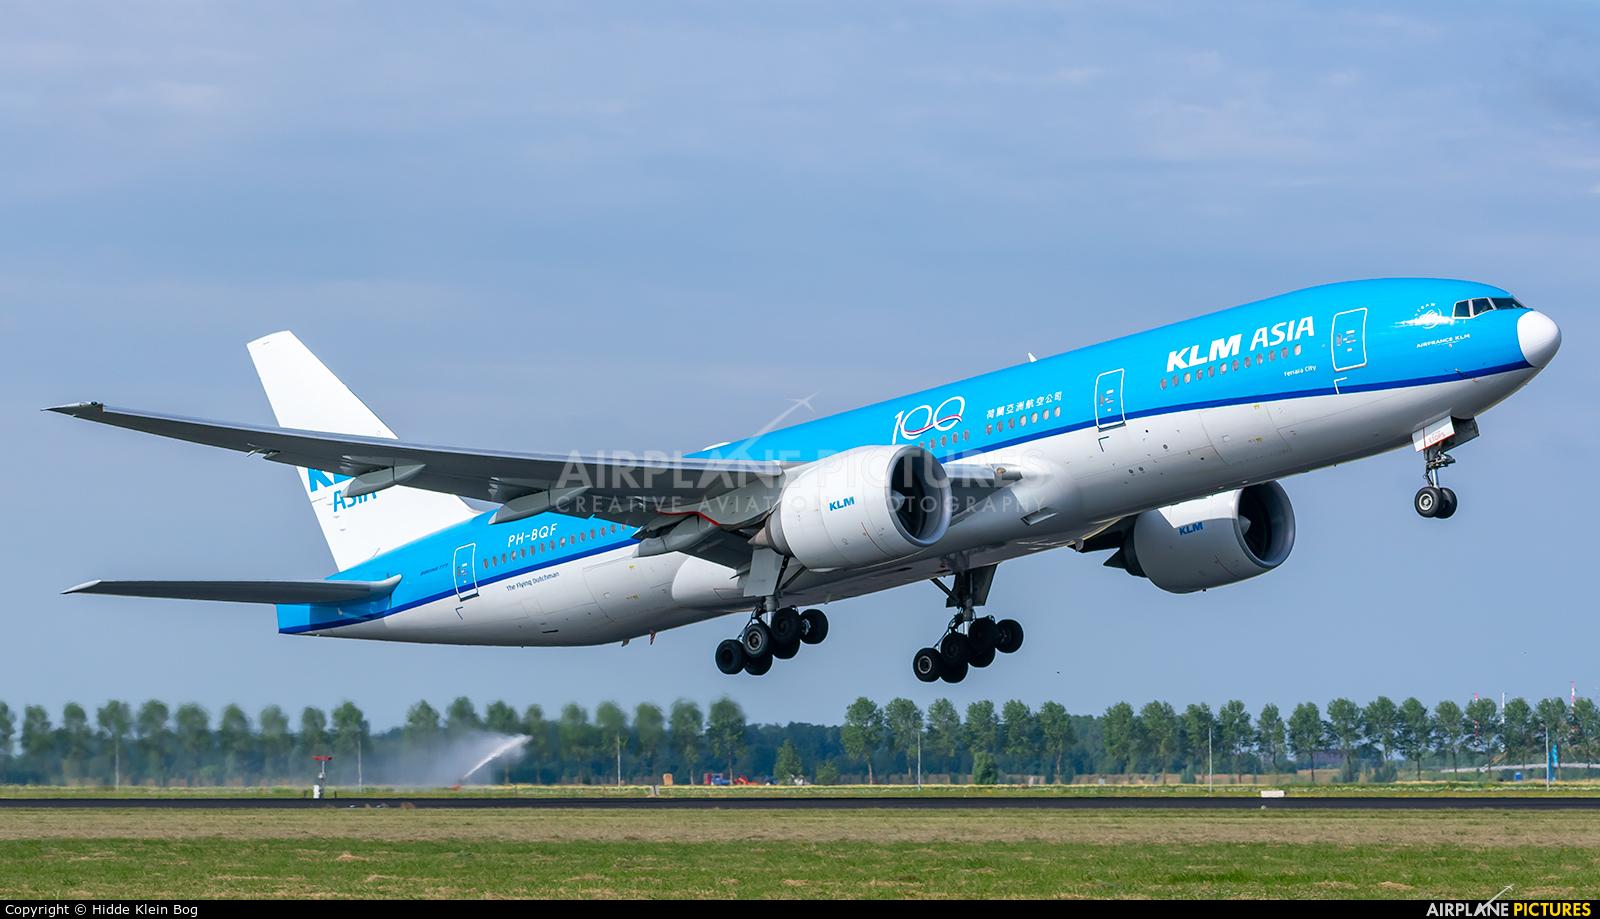 KLM Asia PH-BQF aircraft at Amsterdam - Schiphol